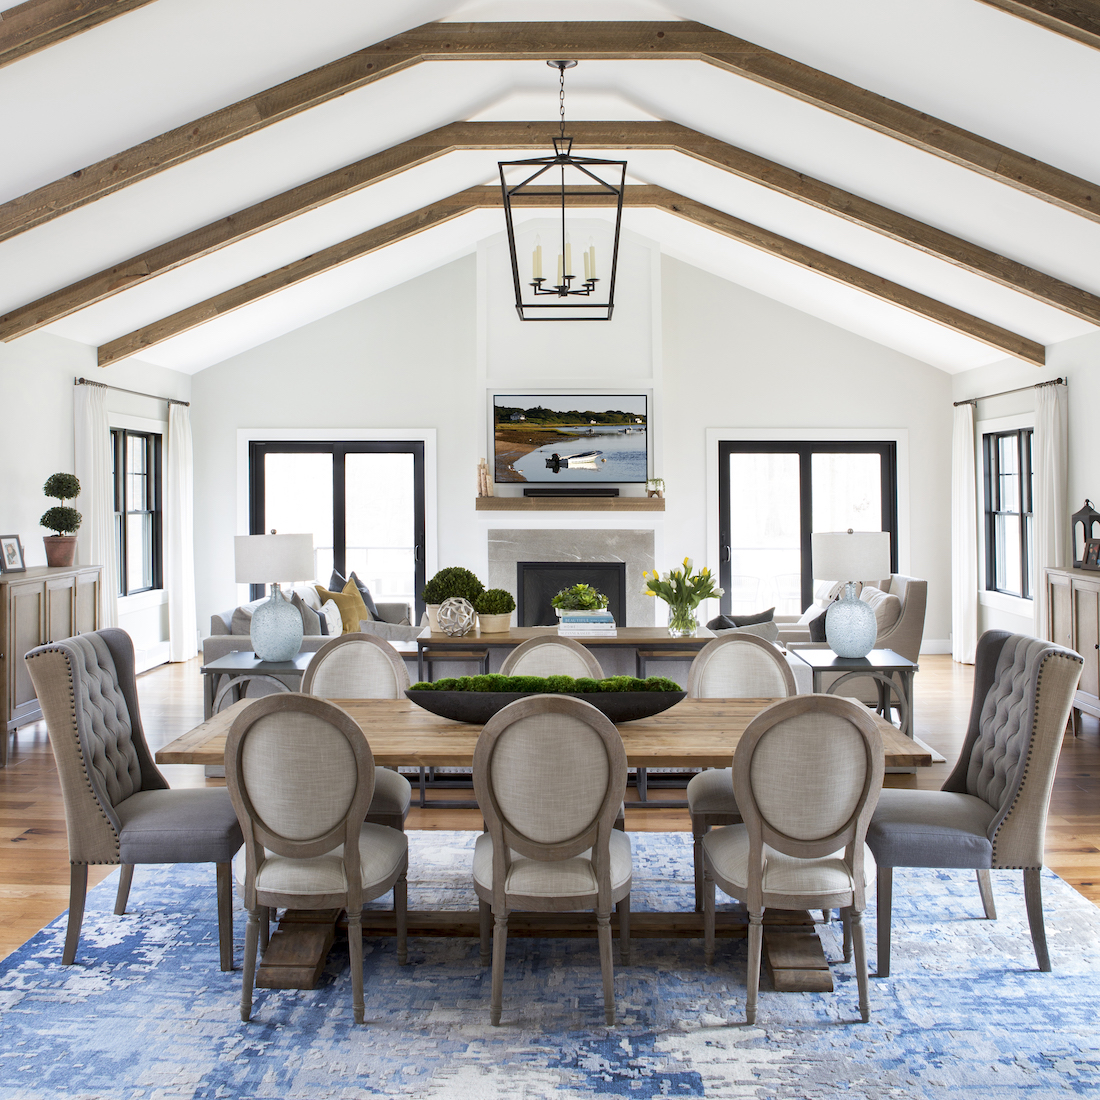 princeton-nj-dining-room-family-room-interior-design-2